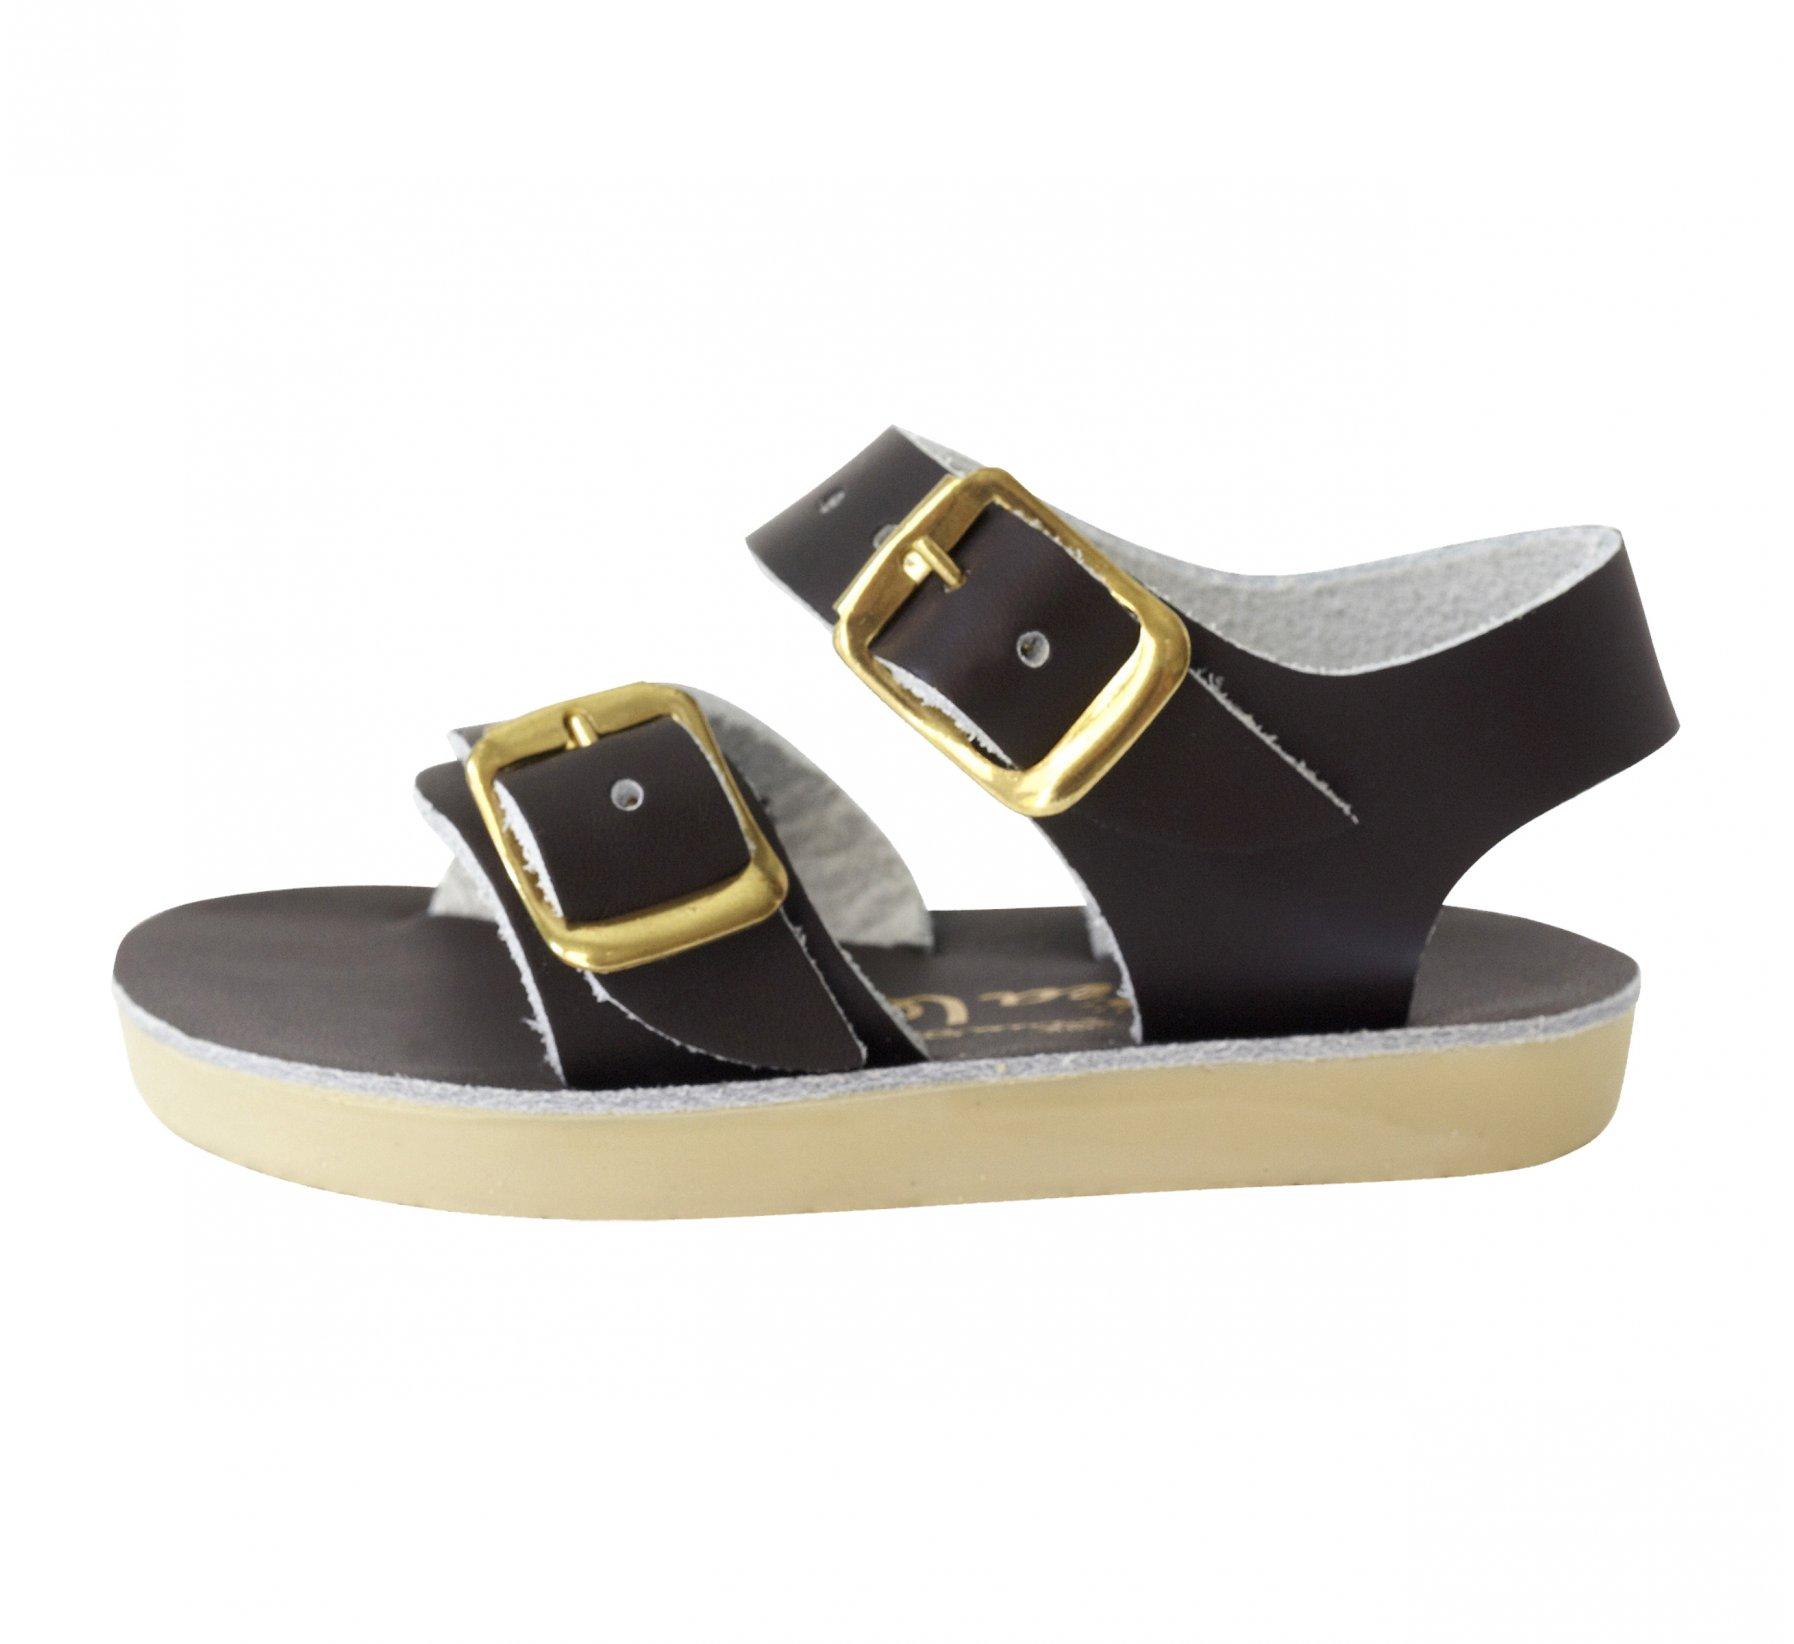 Seawee Marron - Salt Water Sandals